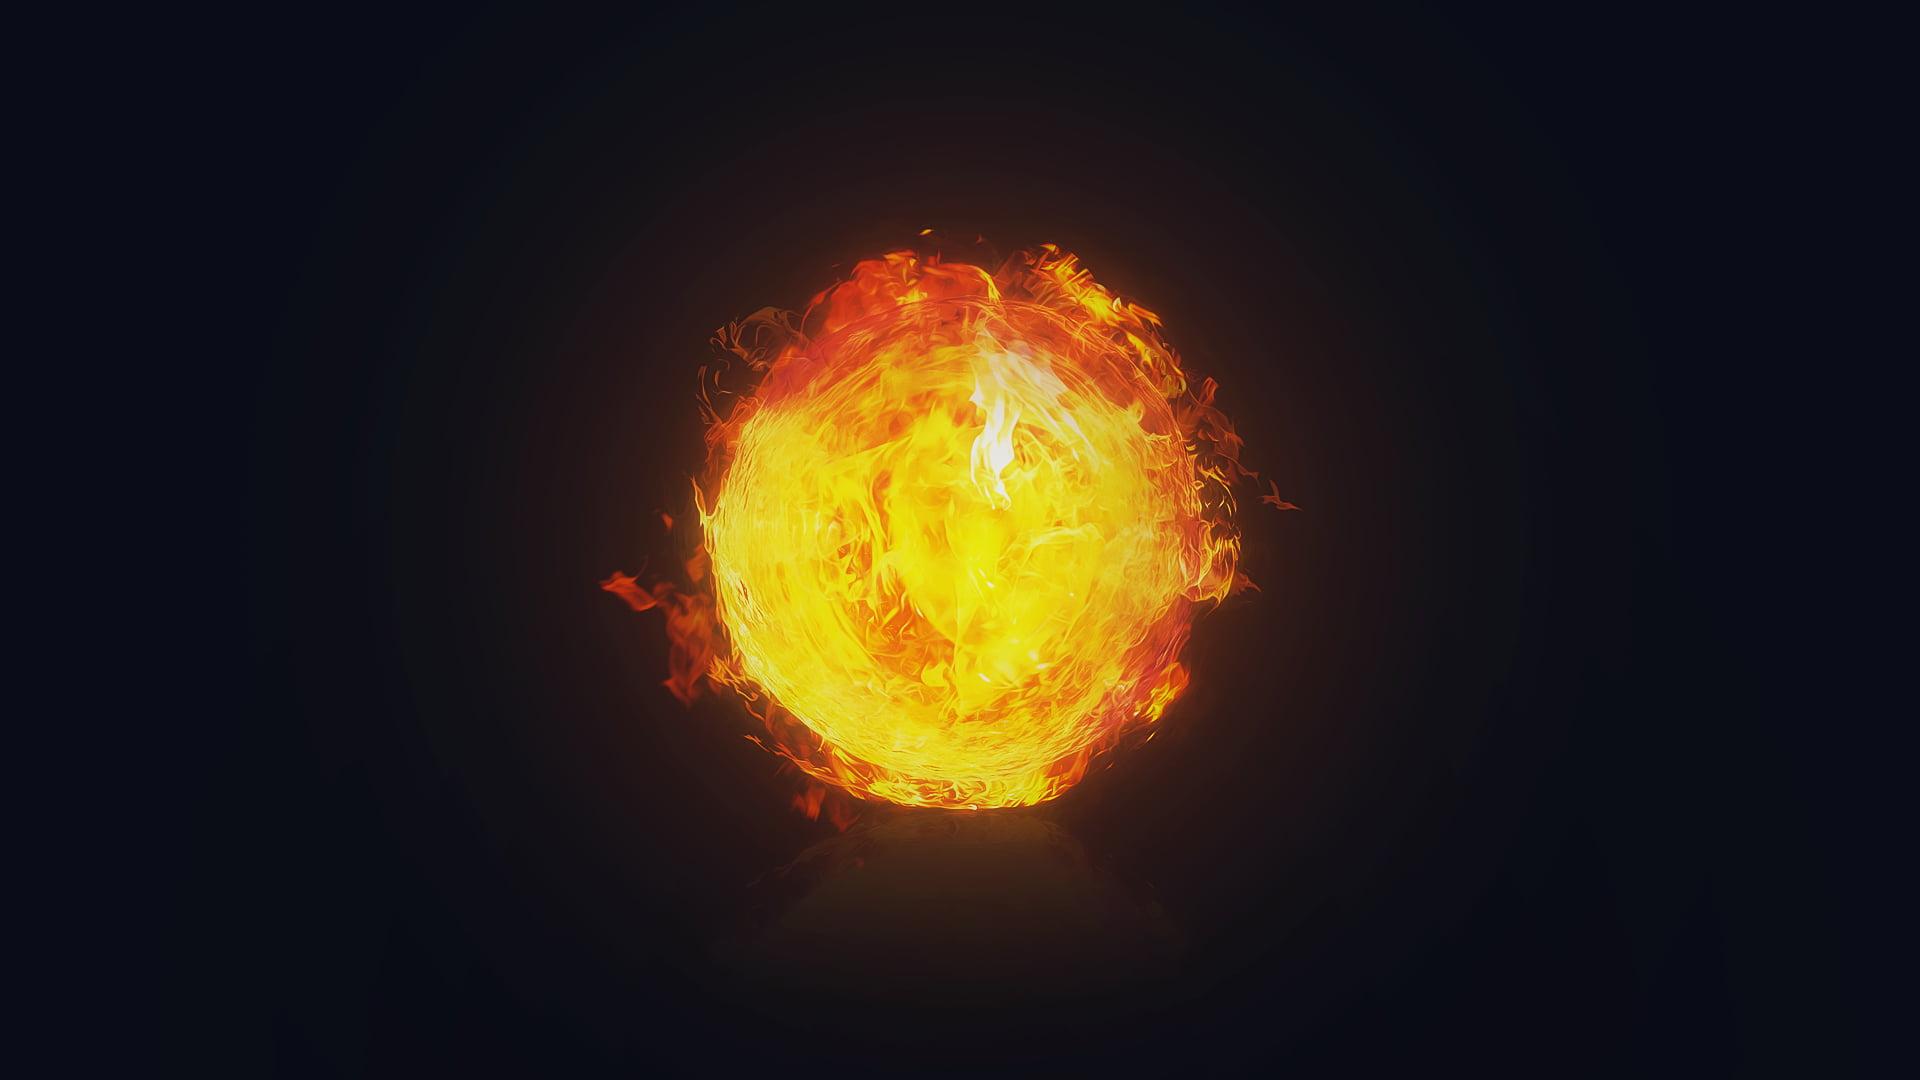 Red flame fireballs The Eye of Sauron Sauron fire HD wallpaper 1920x1080